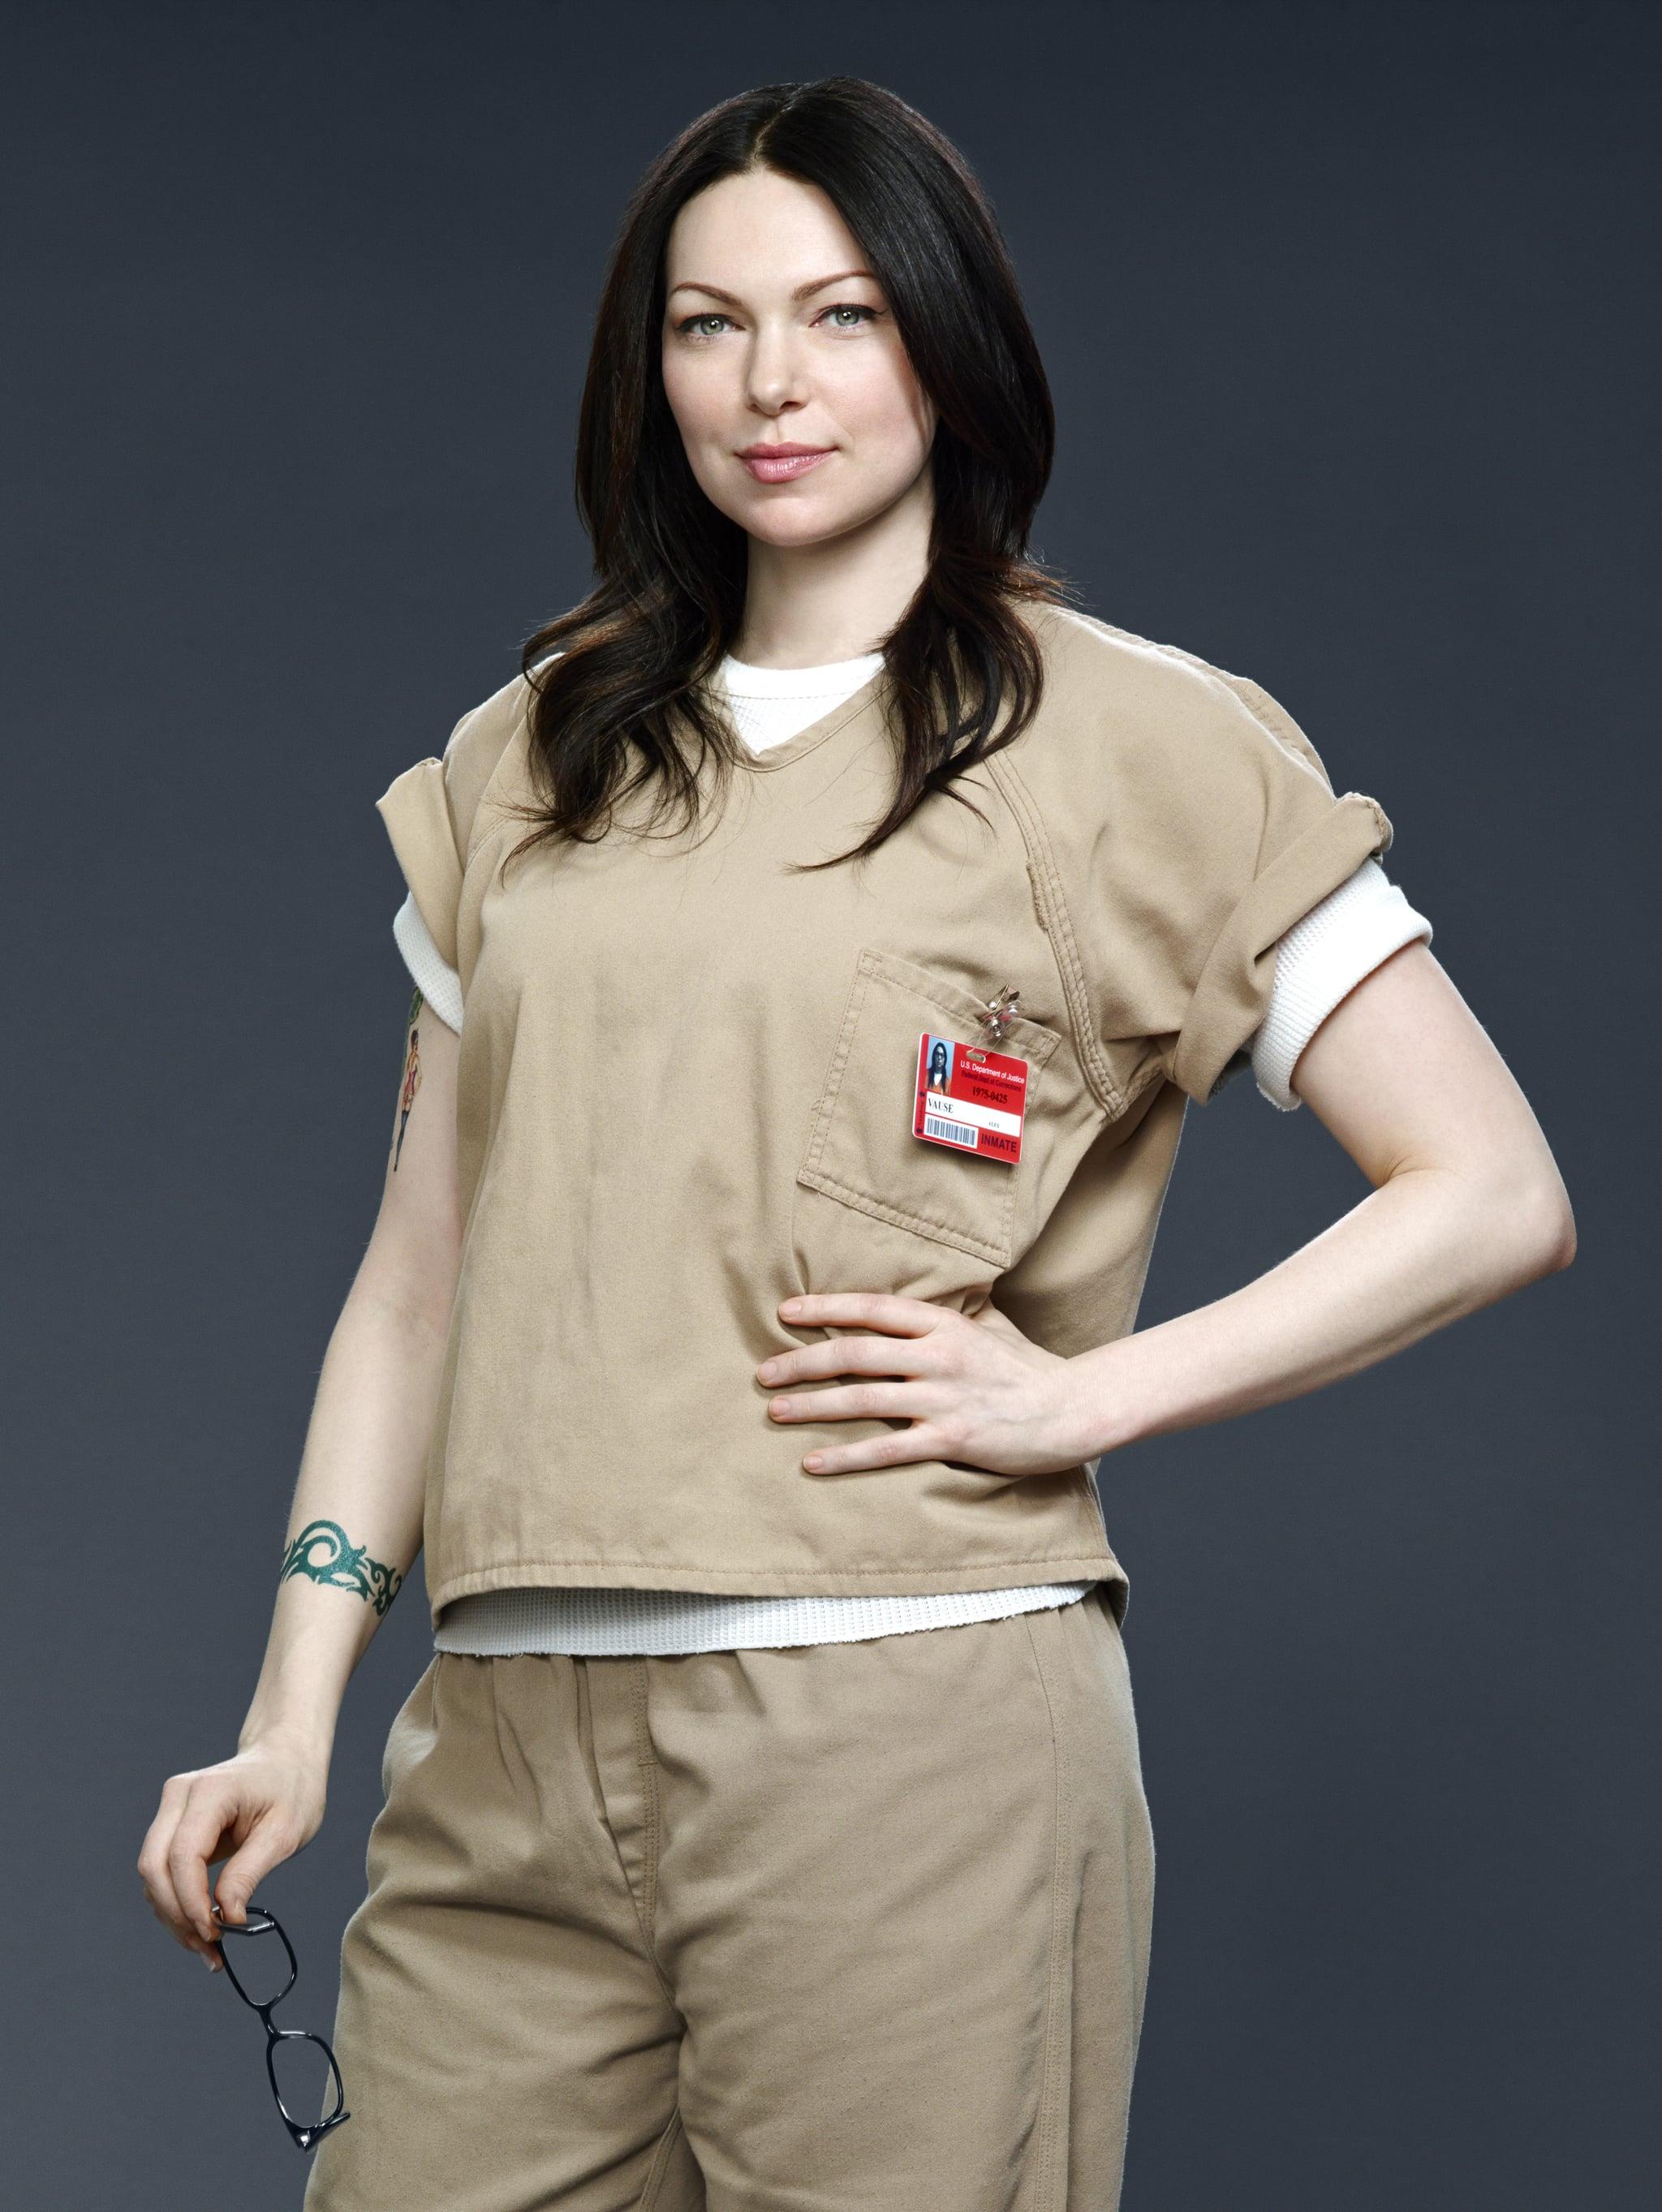 Laura Prepon as Alex Vause